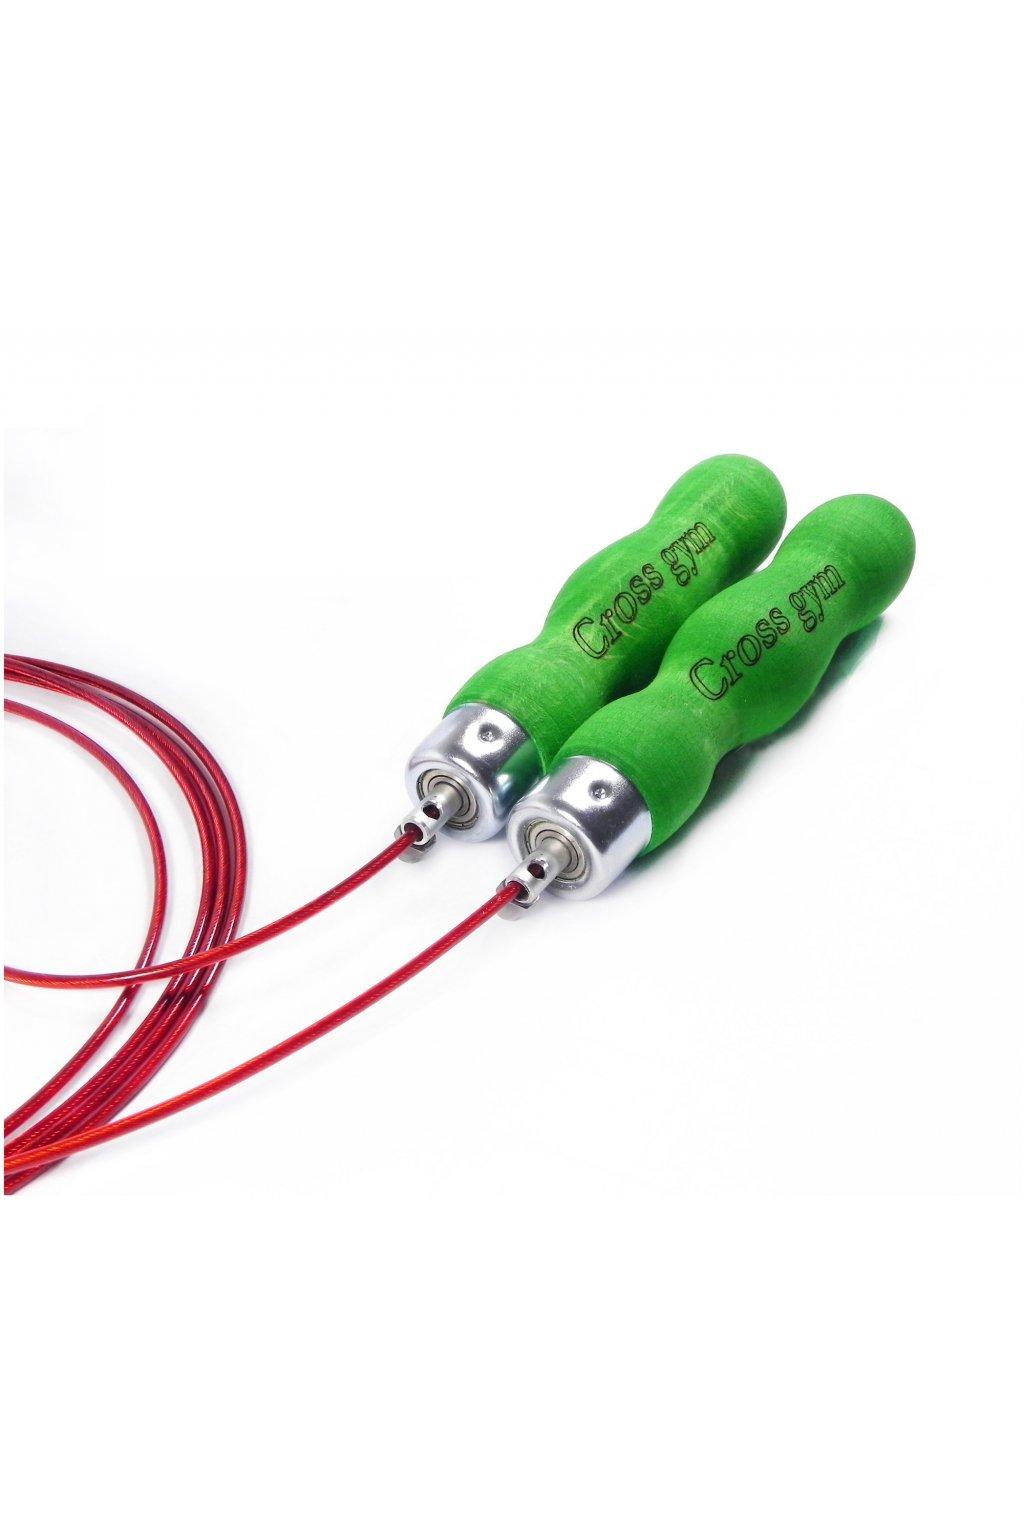 Zelená rukoväť, červené lanko